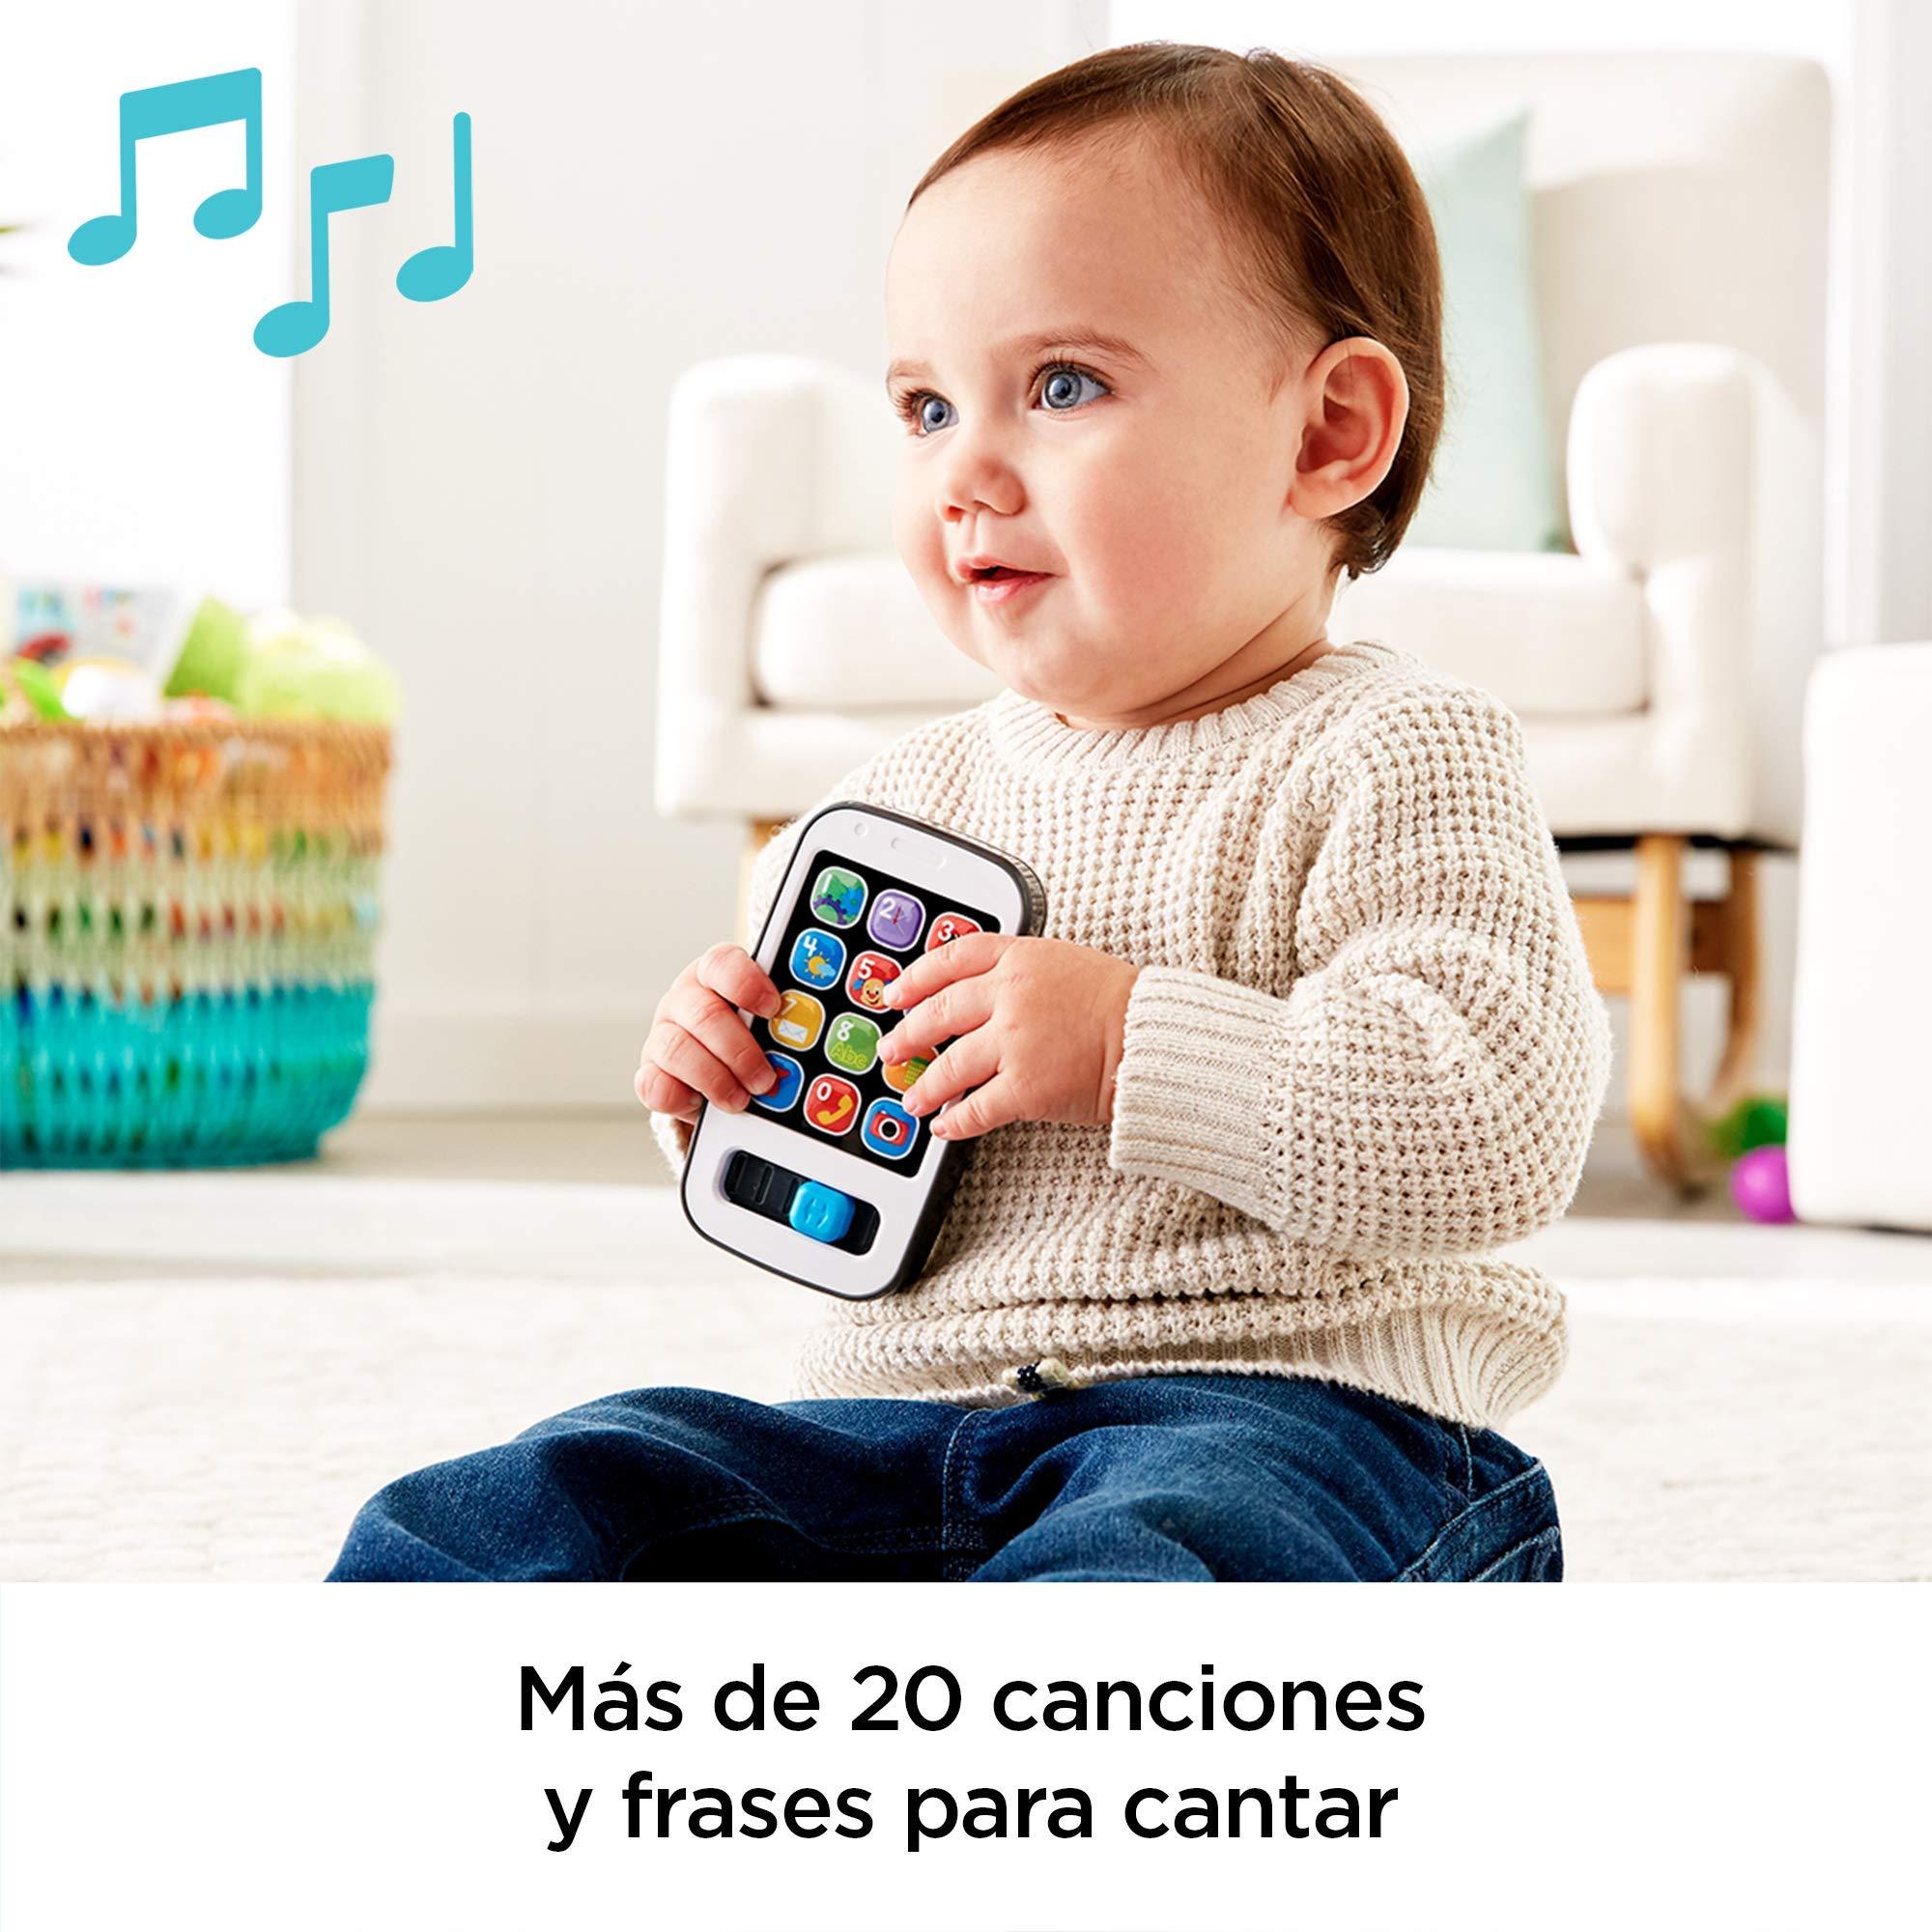 Fisher-Price Mi primer teléfono descubrimiento, juguete bebé +6 ...